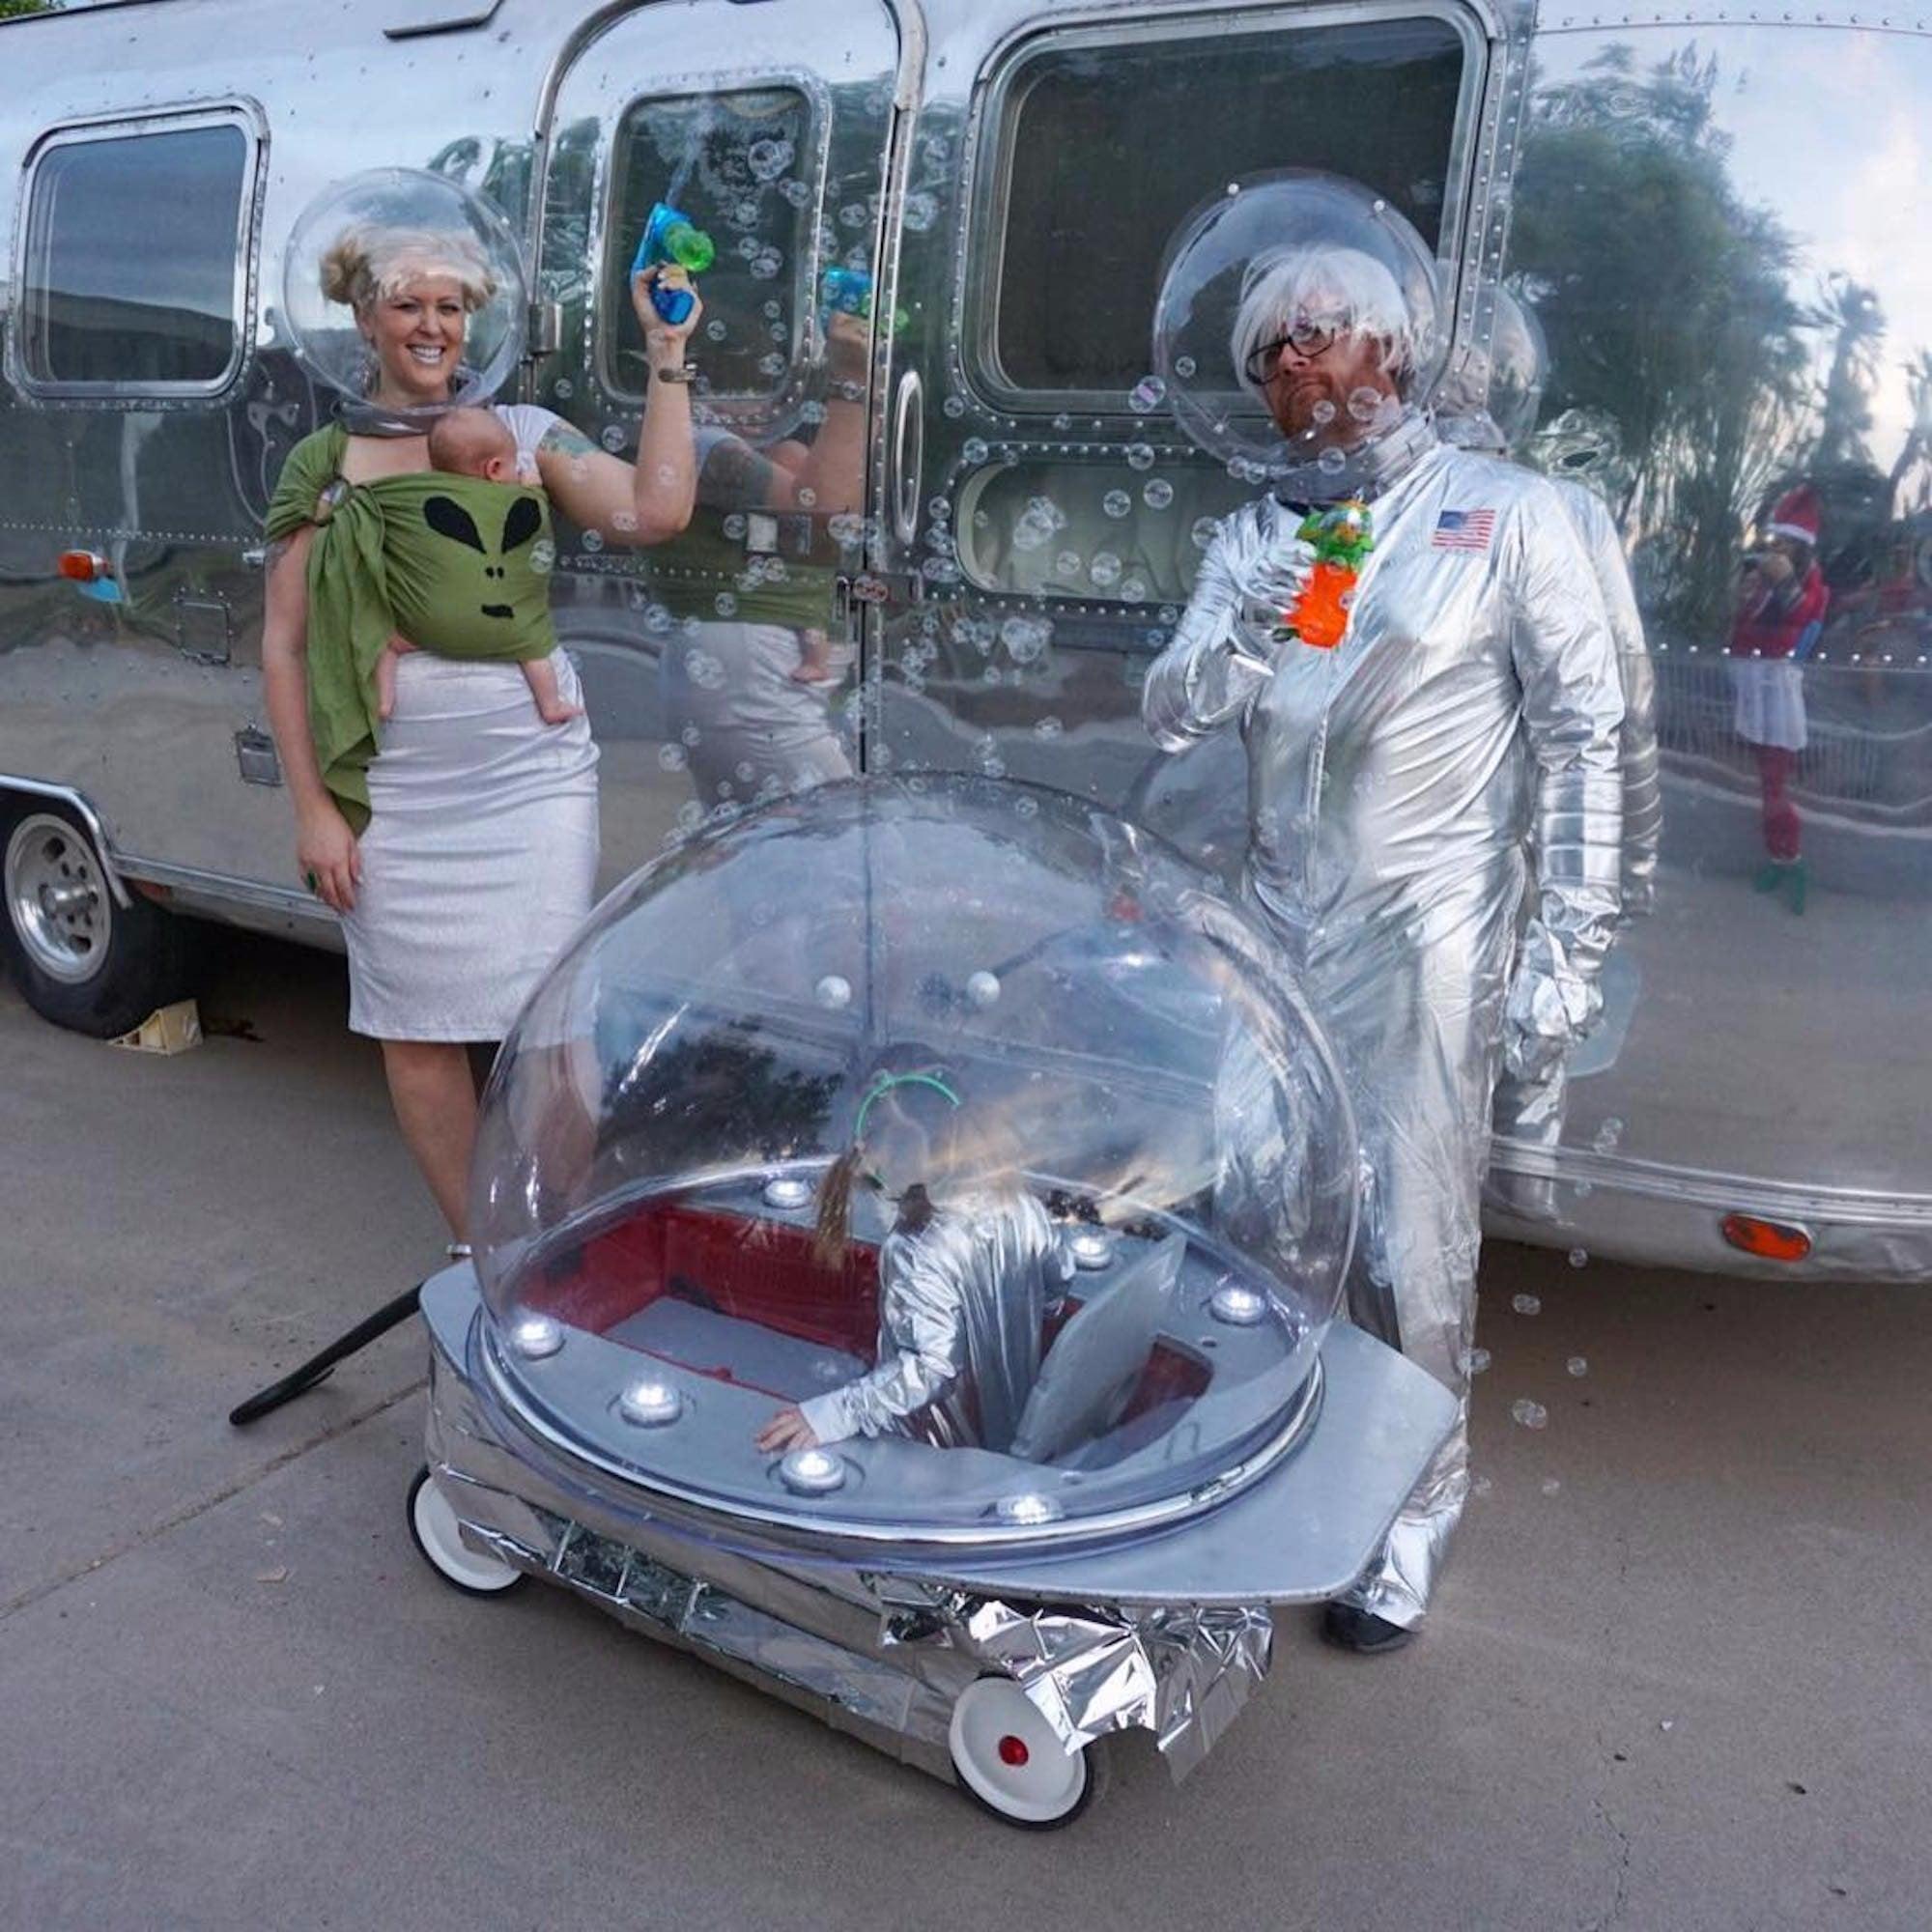 sc 1 st  POPSUGAR Australia & Alien Family Halloween Costume | POPSUGAR Australia Parenting